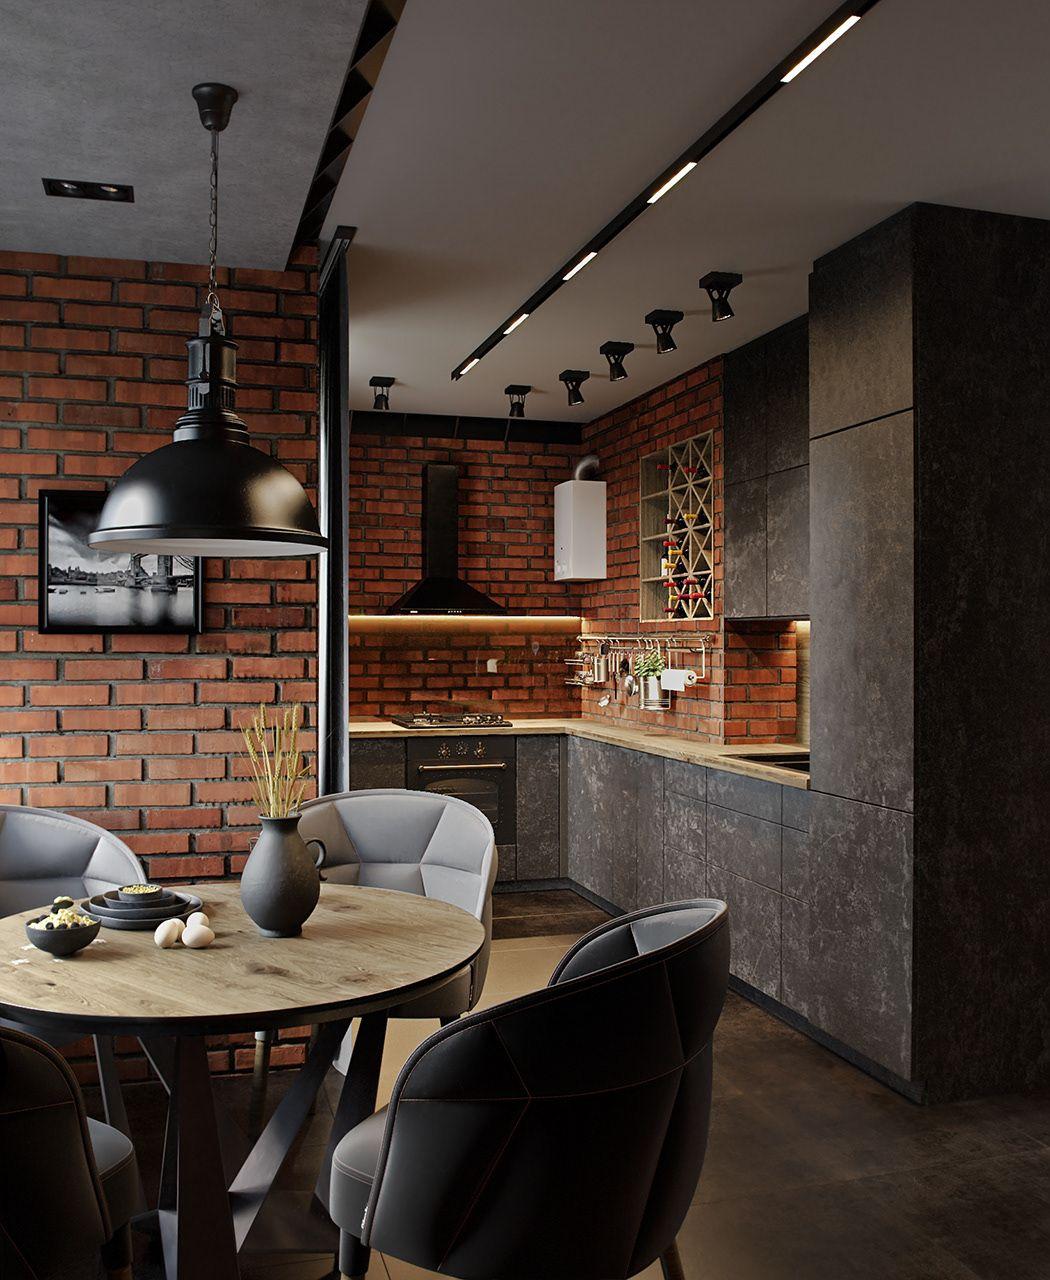 101 Industrial Kitchen Ideas Photos Industrial Kitchen Design Kitchen Inspiration Design Industrial Style Kitchen